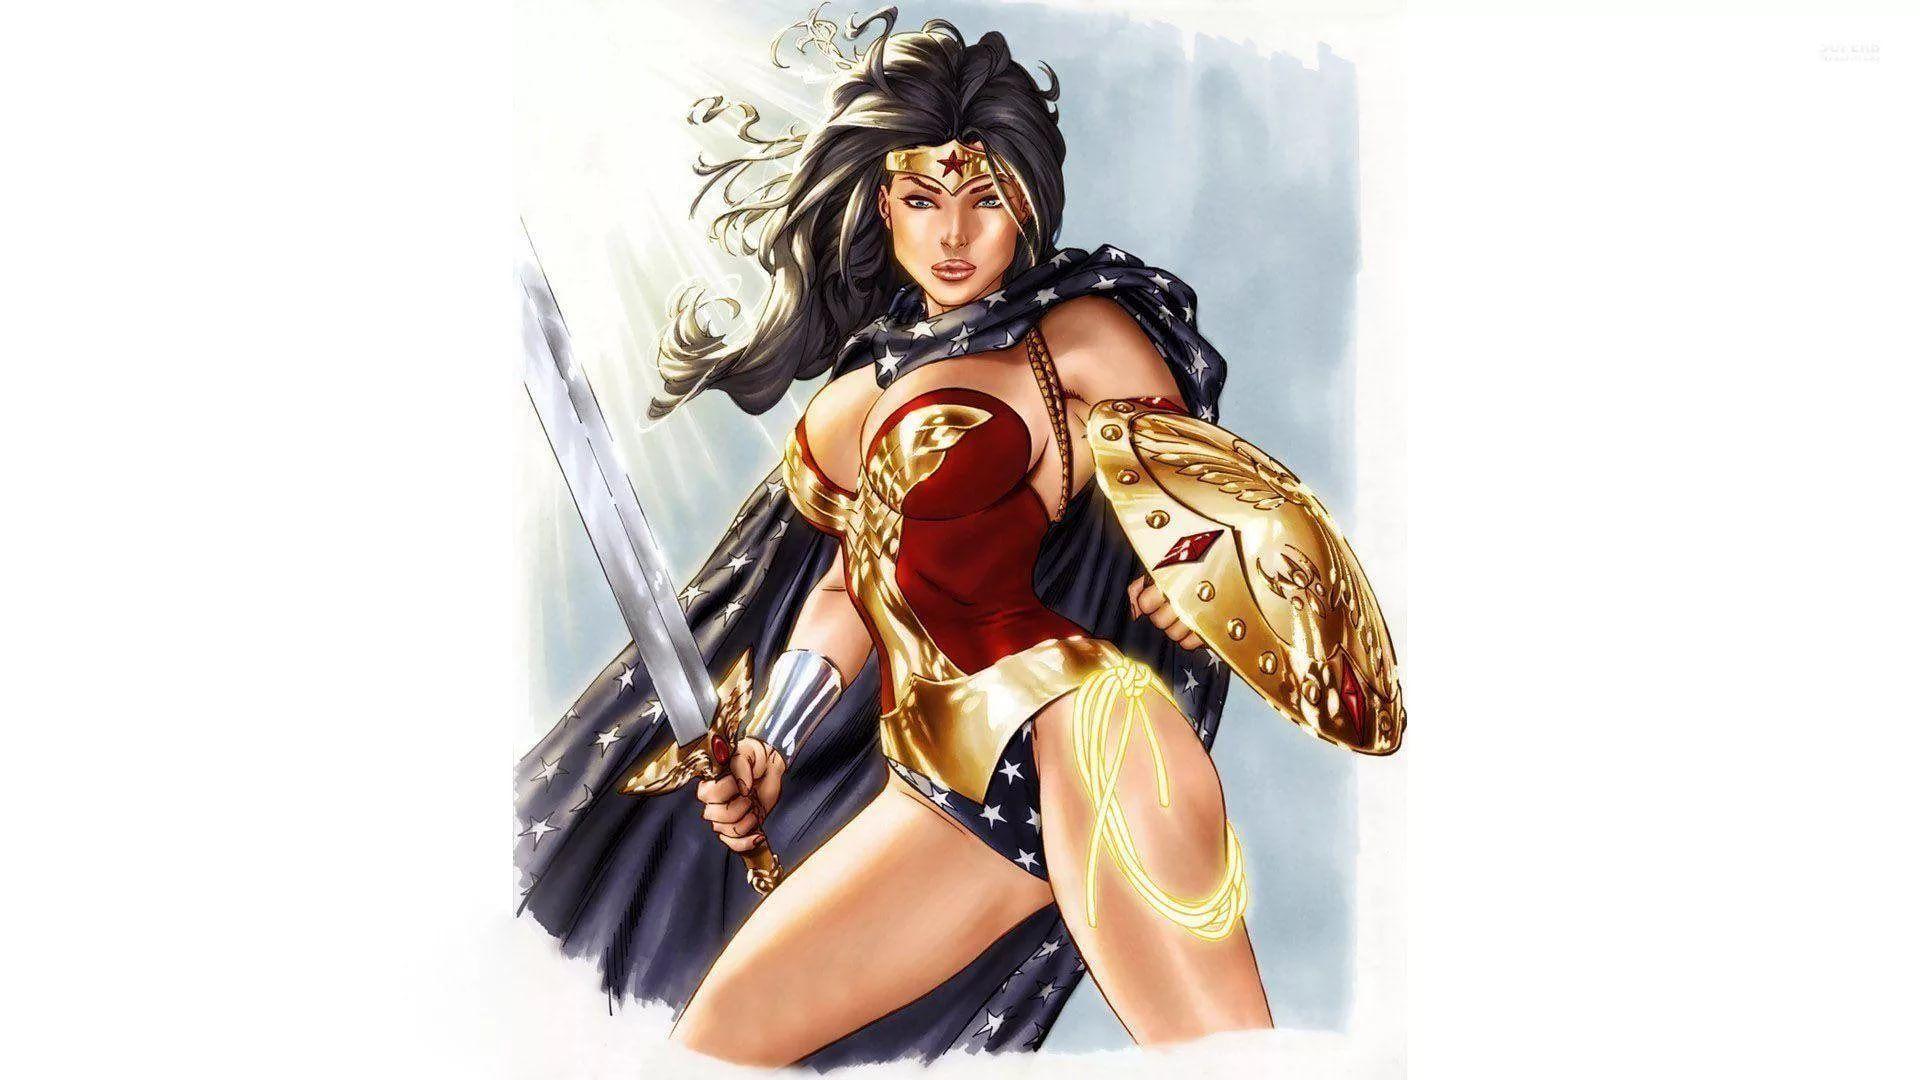 Wonder Woman Hot hd desktop wallpaper